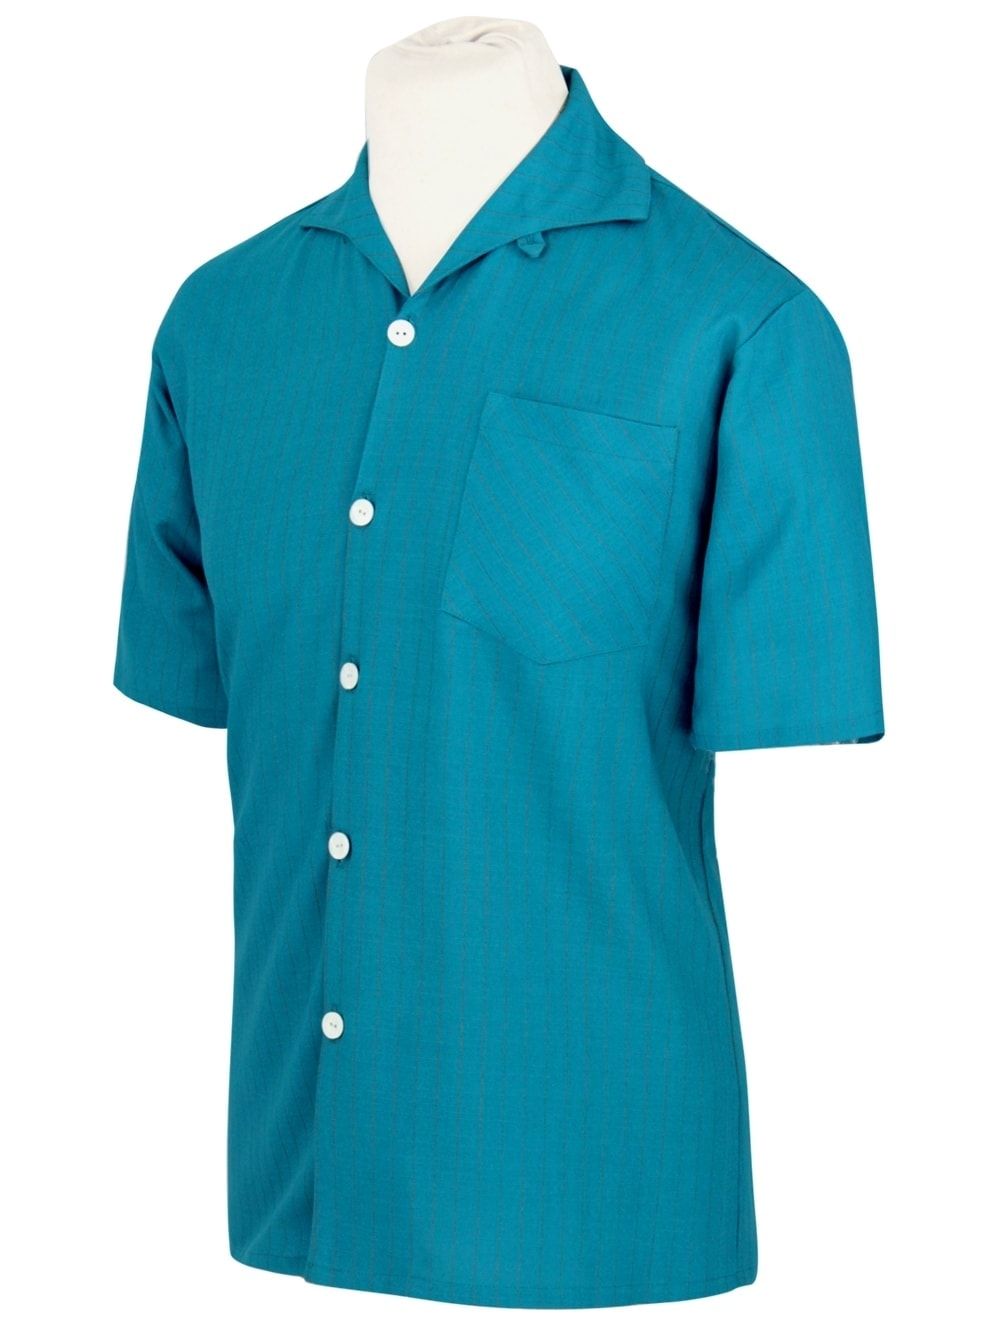 Men 39 S Short Sleeved Pinstripe Teal Shirt From Vivien Of